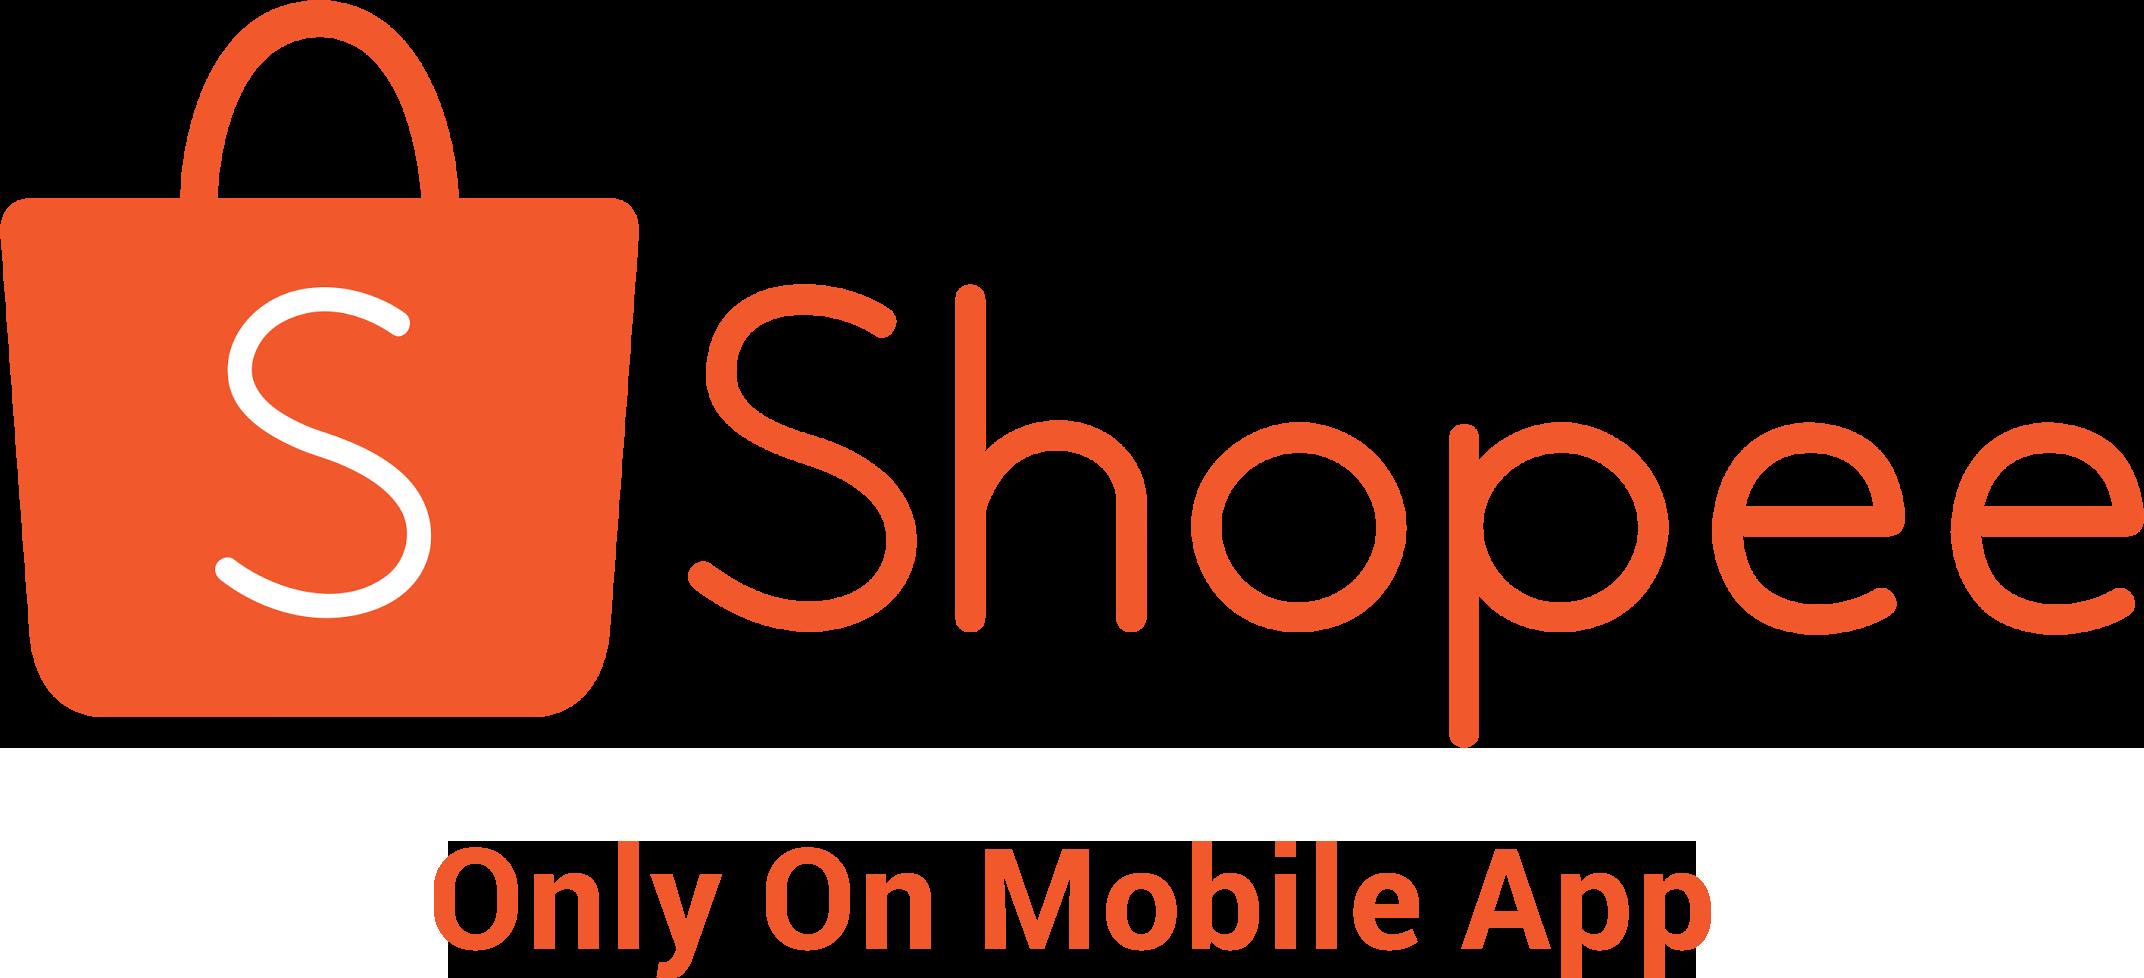 Shopee Mobile App Promotions & Discounts